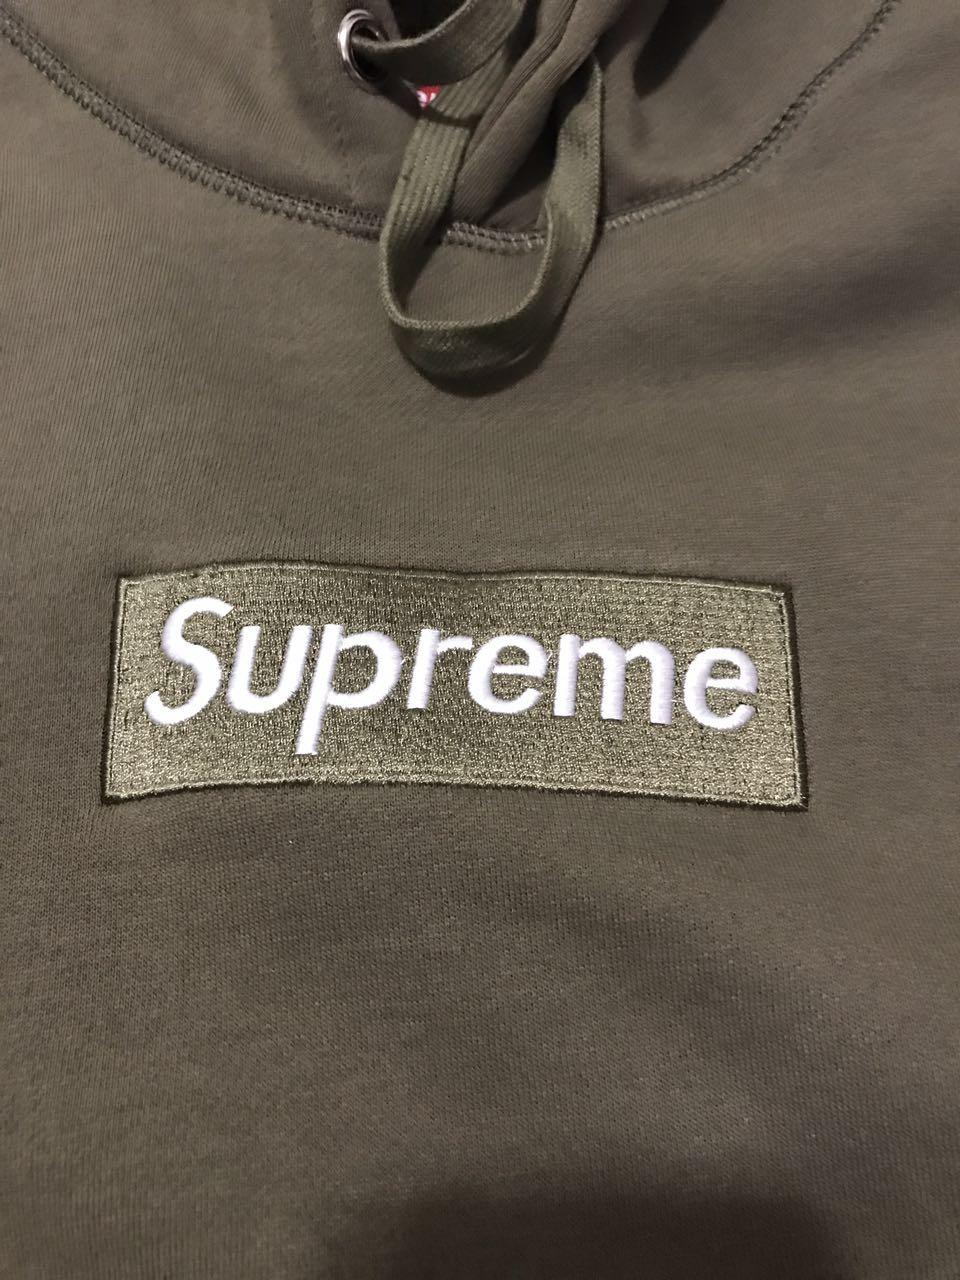 d3db22f33d69 Supreme Box Logo Hoodie Olive Green UA Replica on Storenvy